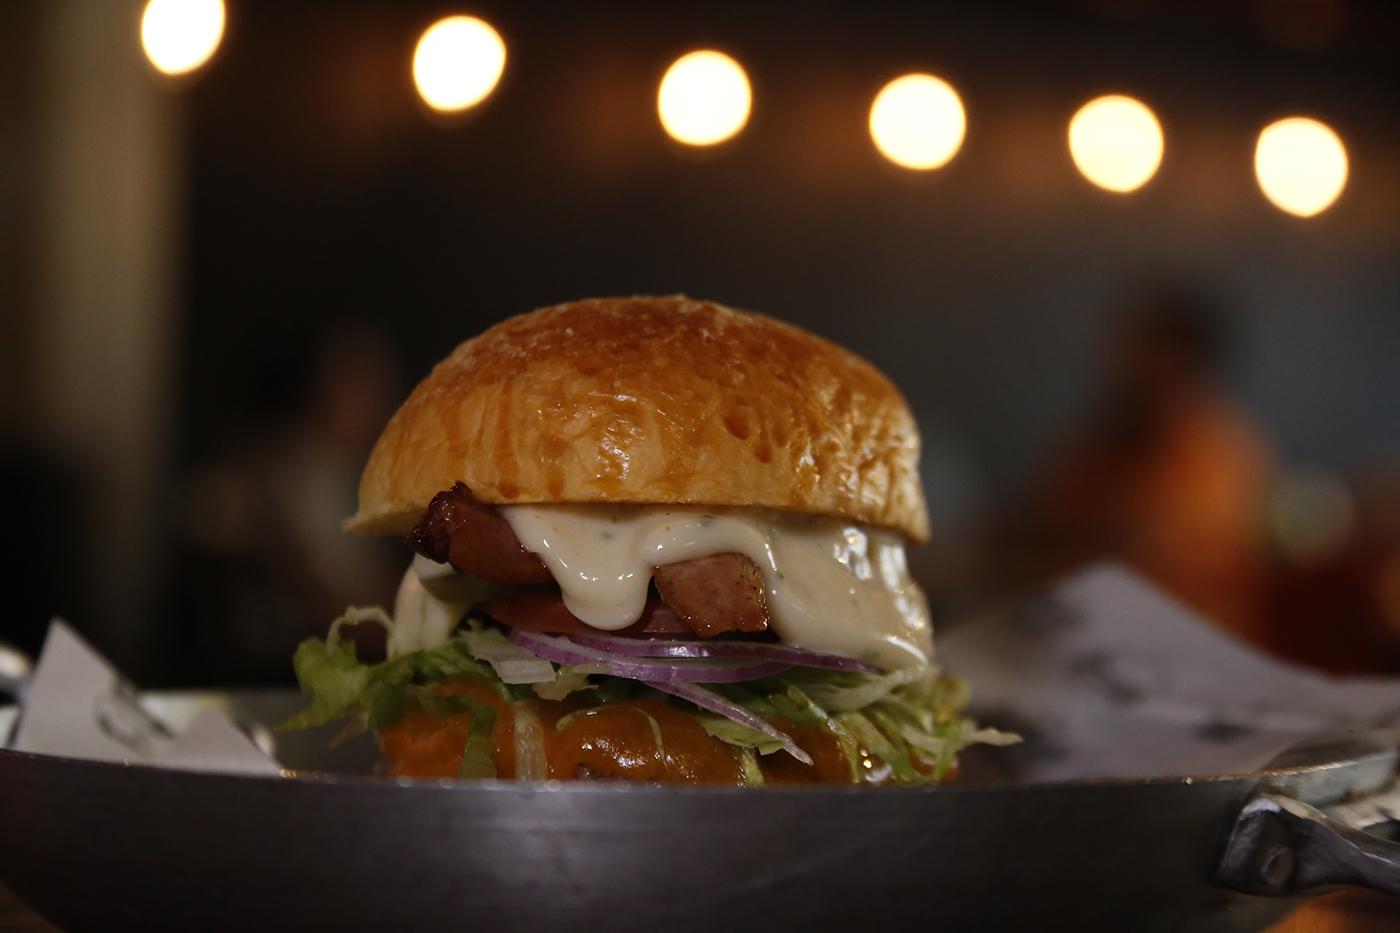 1 Crispy Burger, Chiken Salad ou Smashburger Calabresa a partir de R$10,99